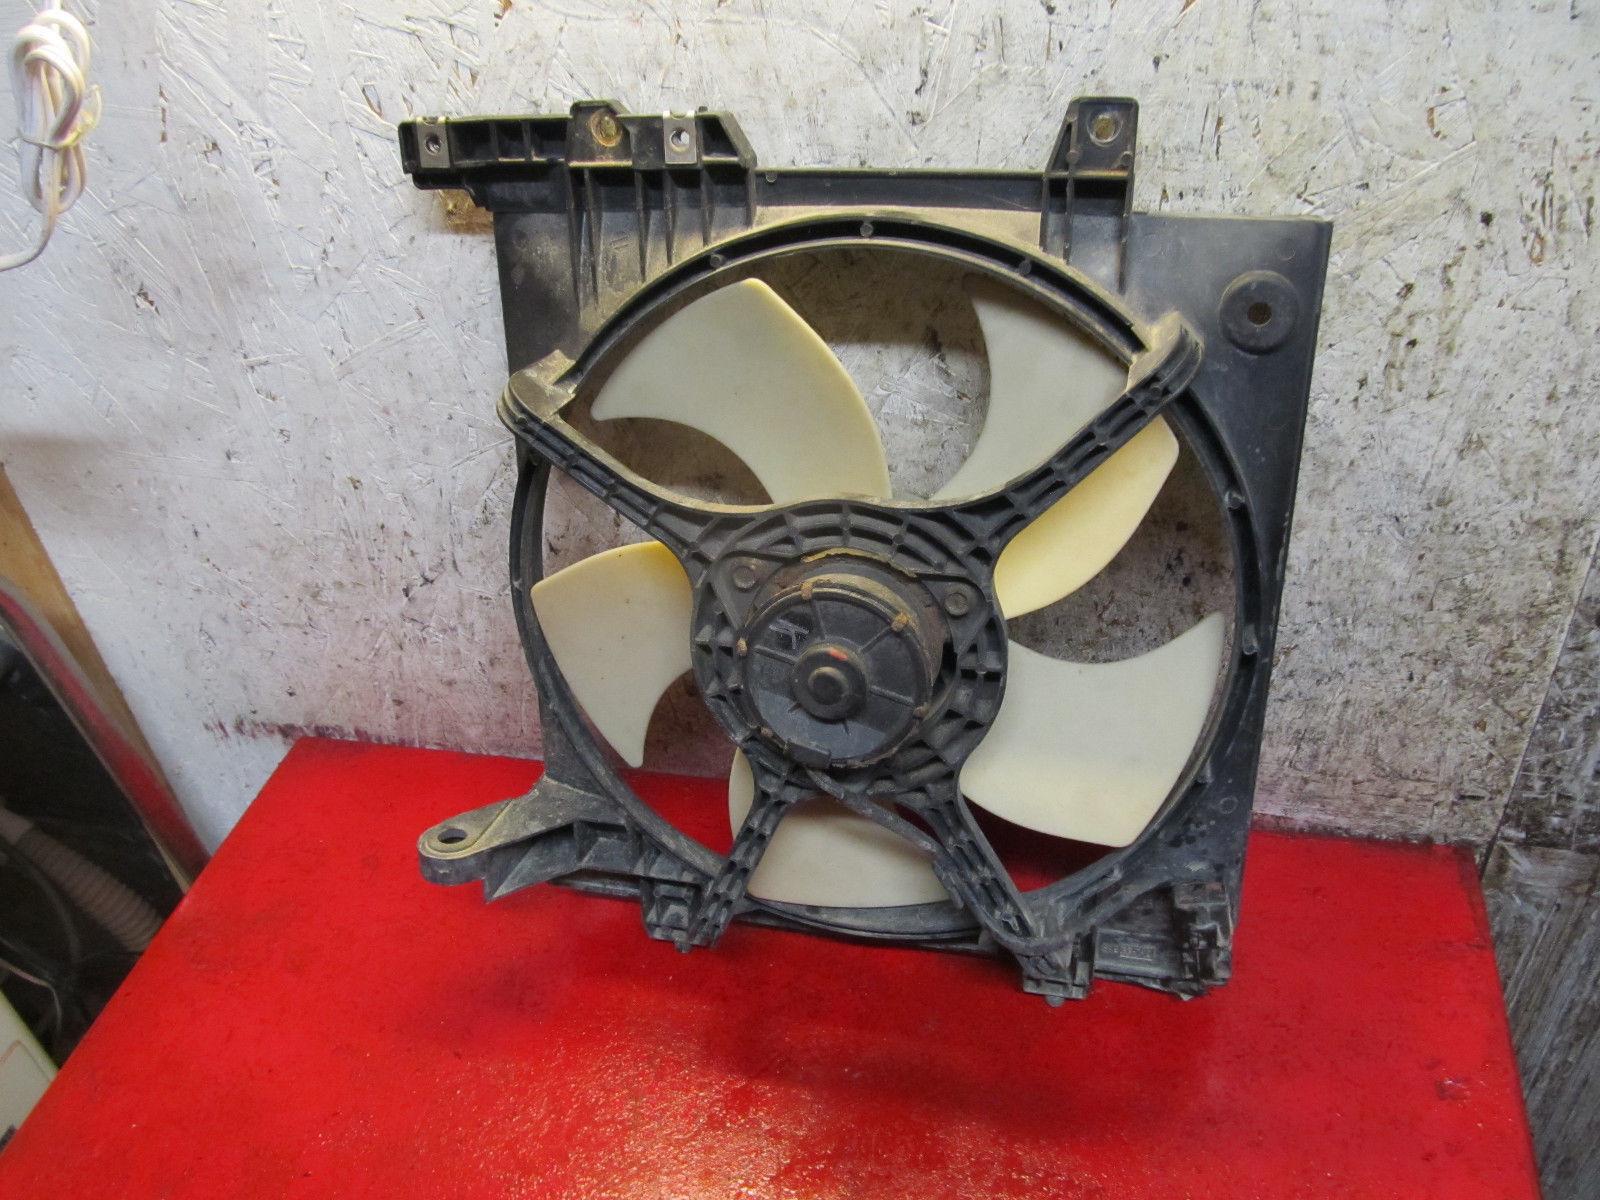 04 03 02 01 00 Subaru Legacy L outback oem 2.5 left side radiator cooling fan